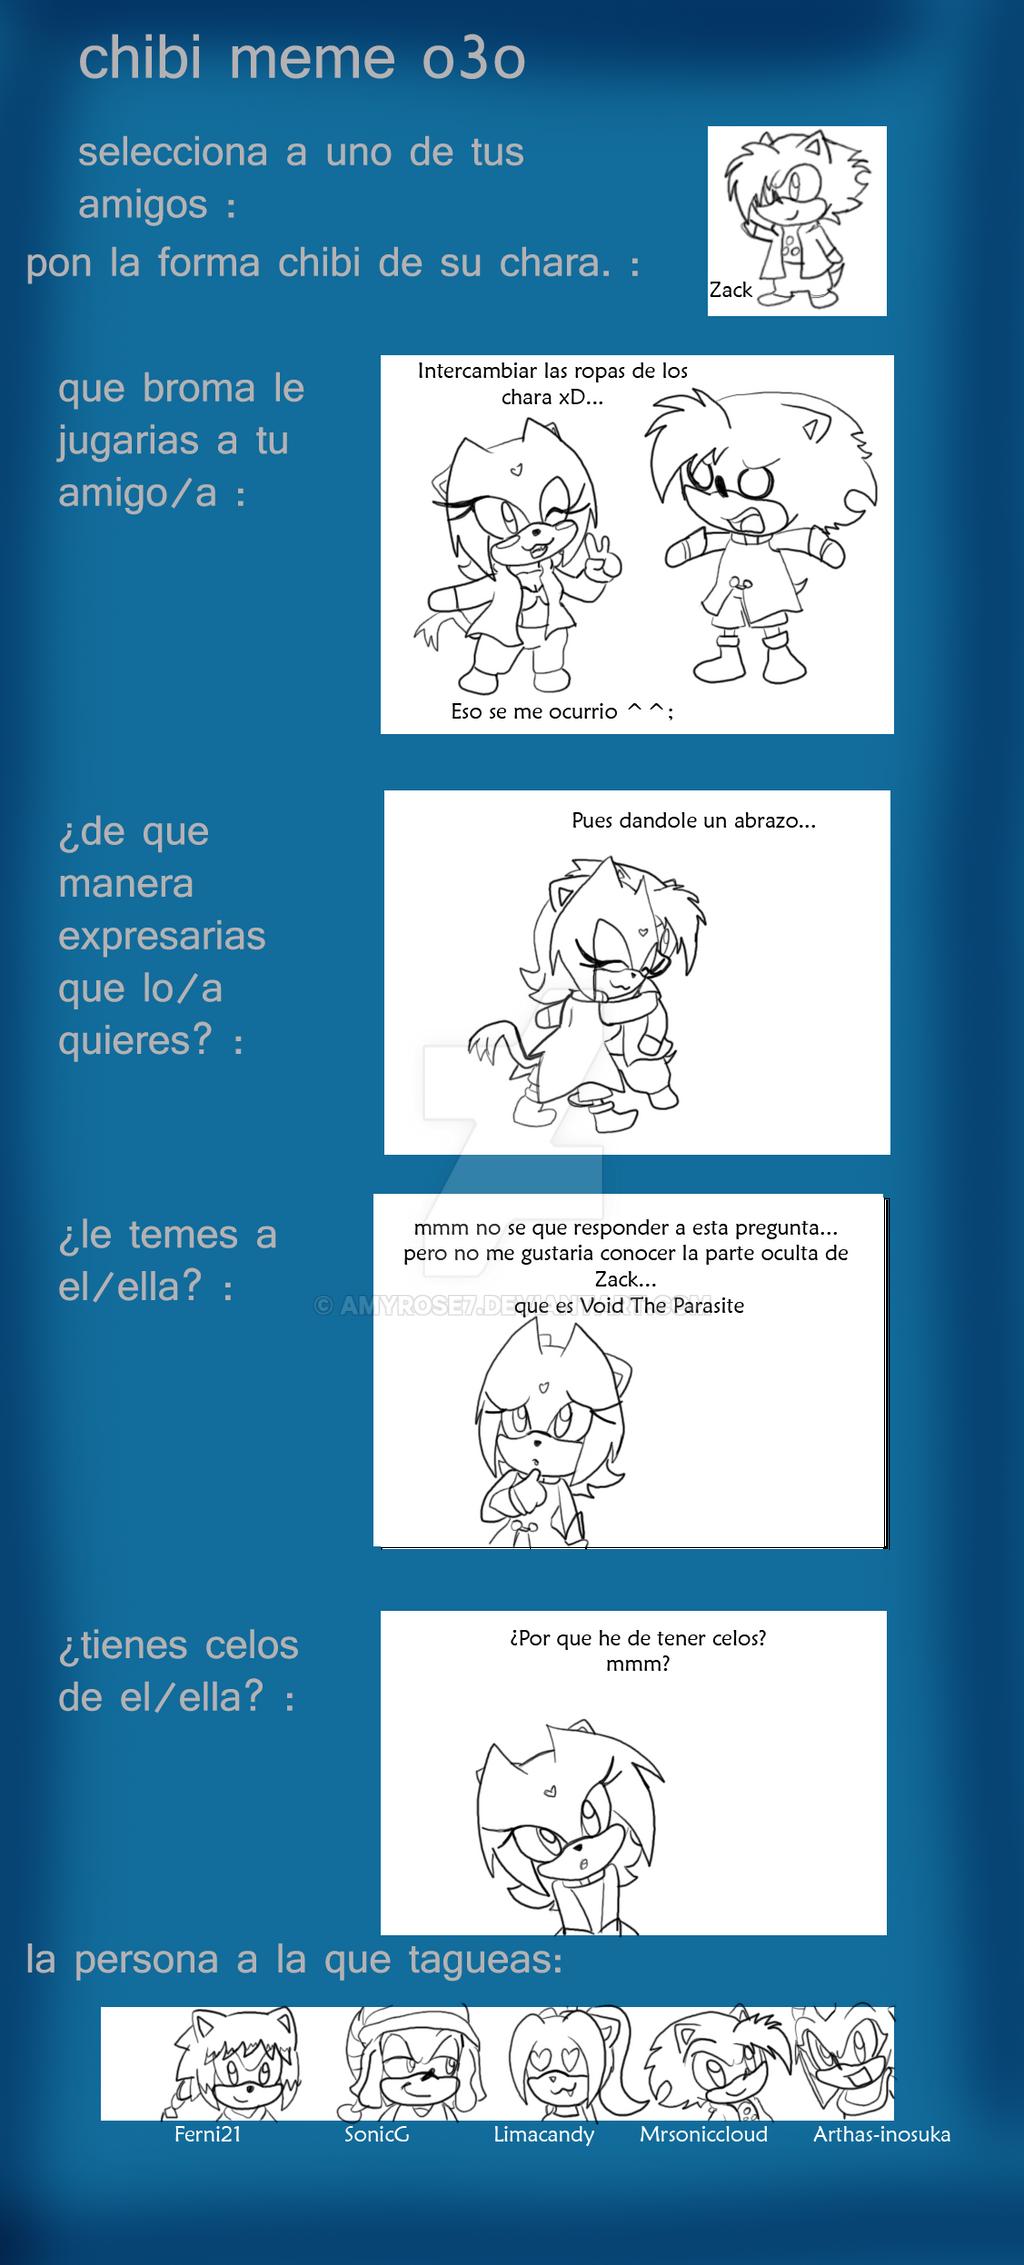 Meme Chibi :3 by amyrose7